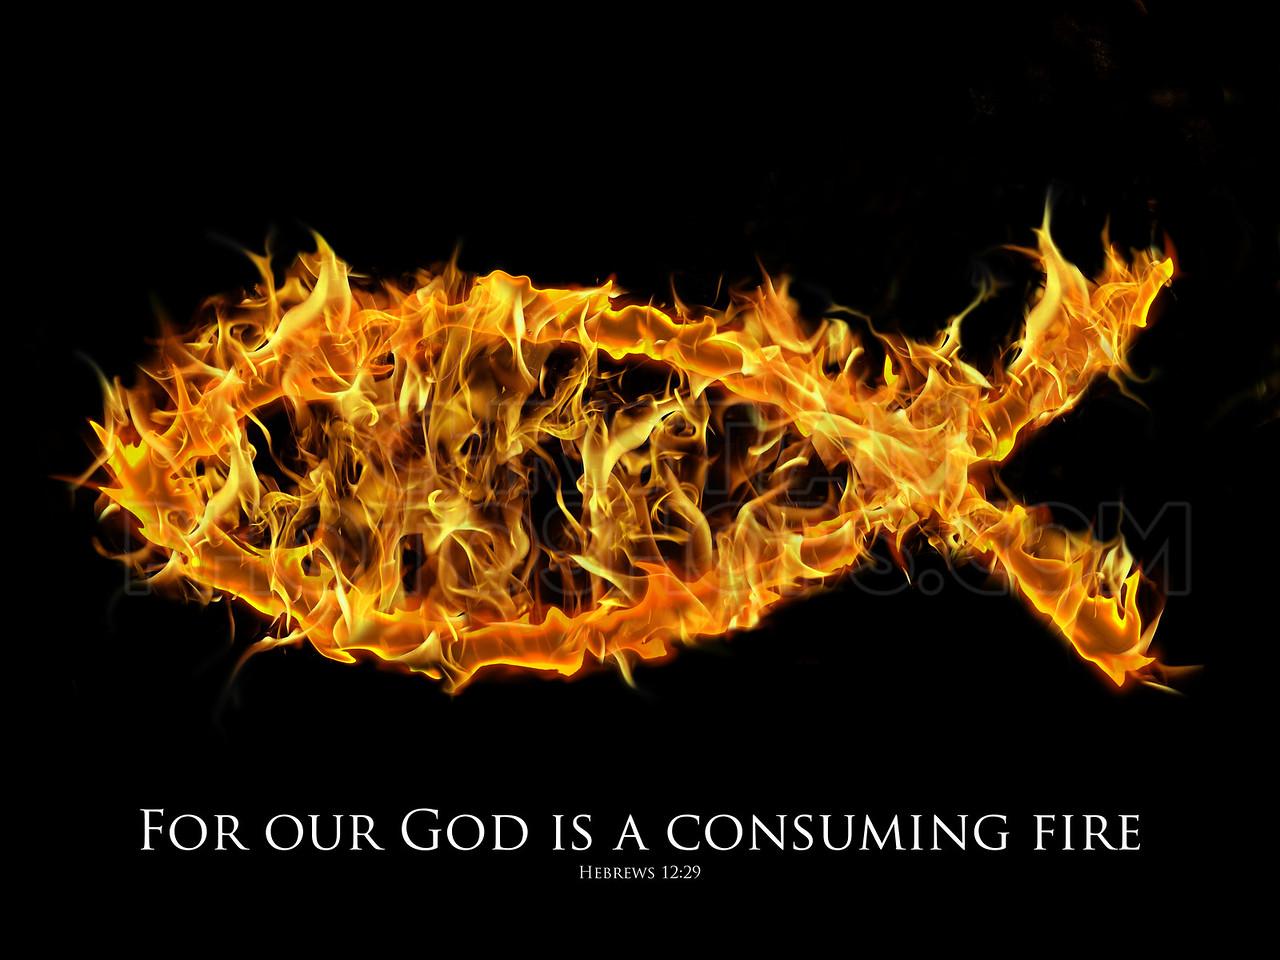 Jesus fish symbol on fire